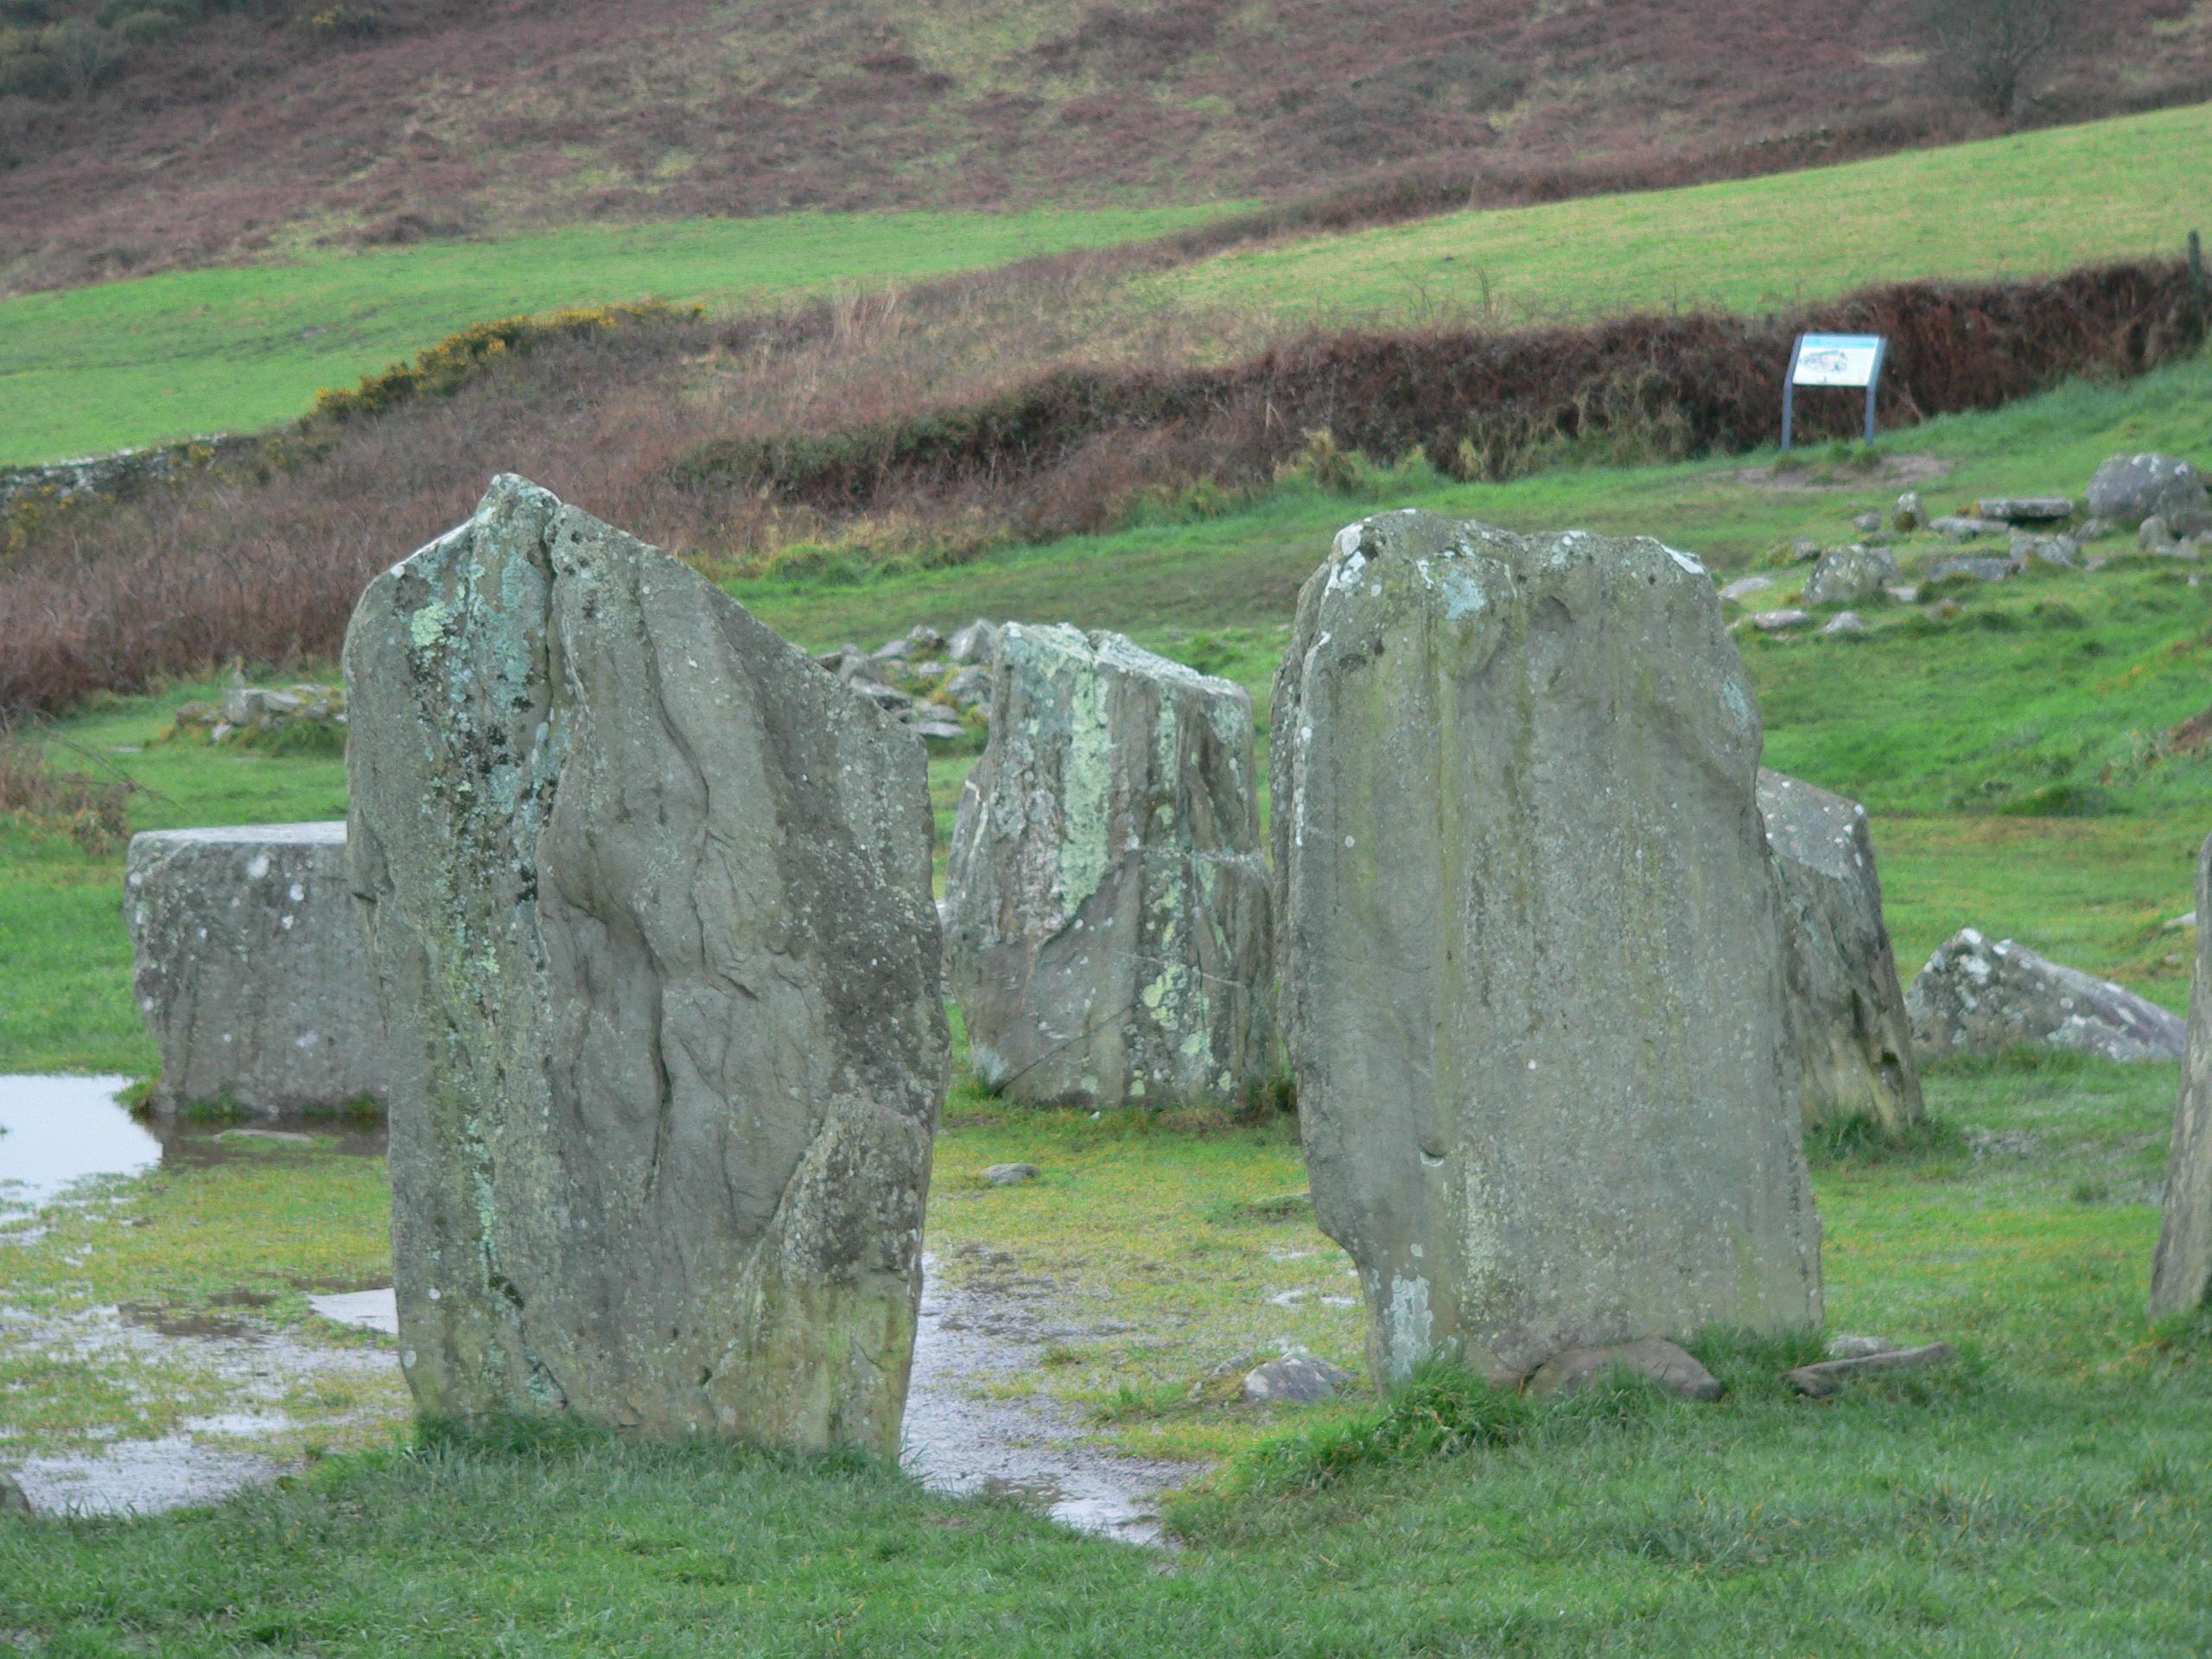 Entrance stones to Drombeg Stone Circle